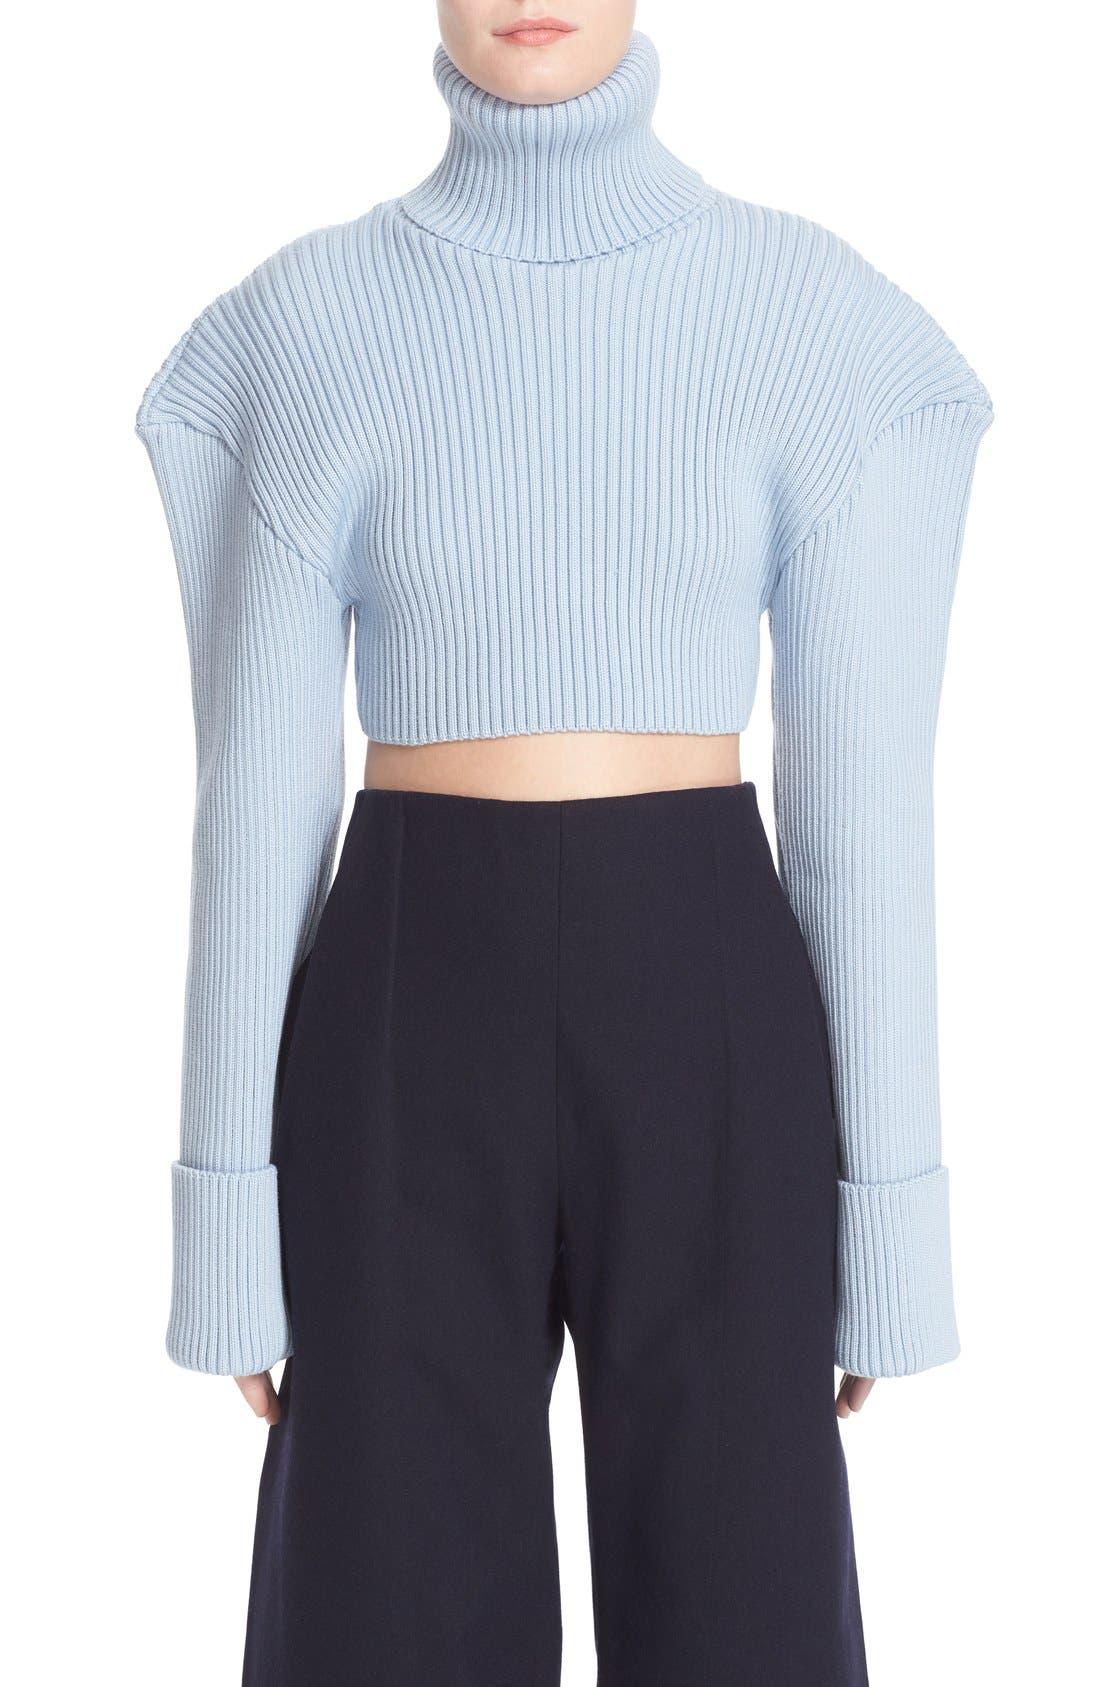 Alternate Image 1 Selected - Jacquemus Cropped Football Shoulder Turtleneck Sweater